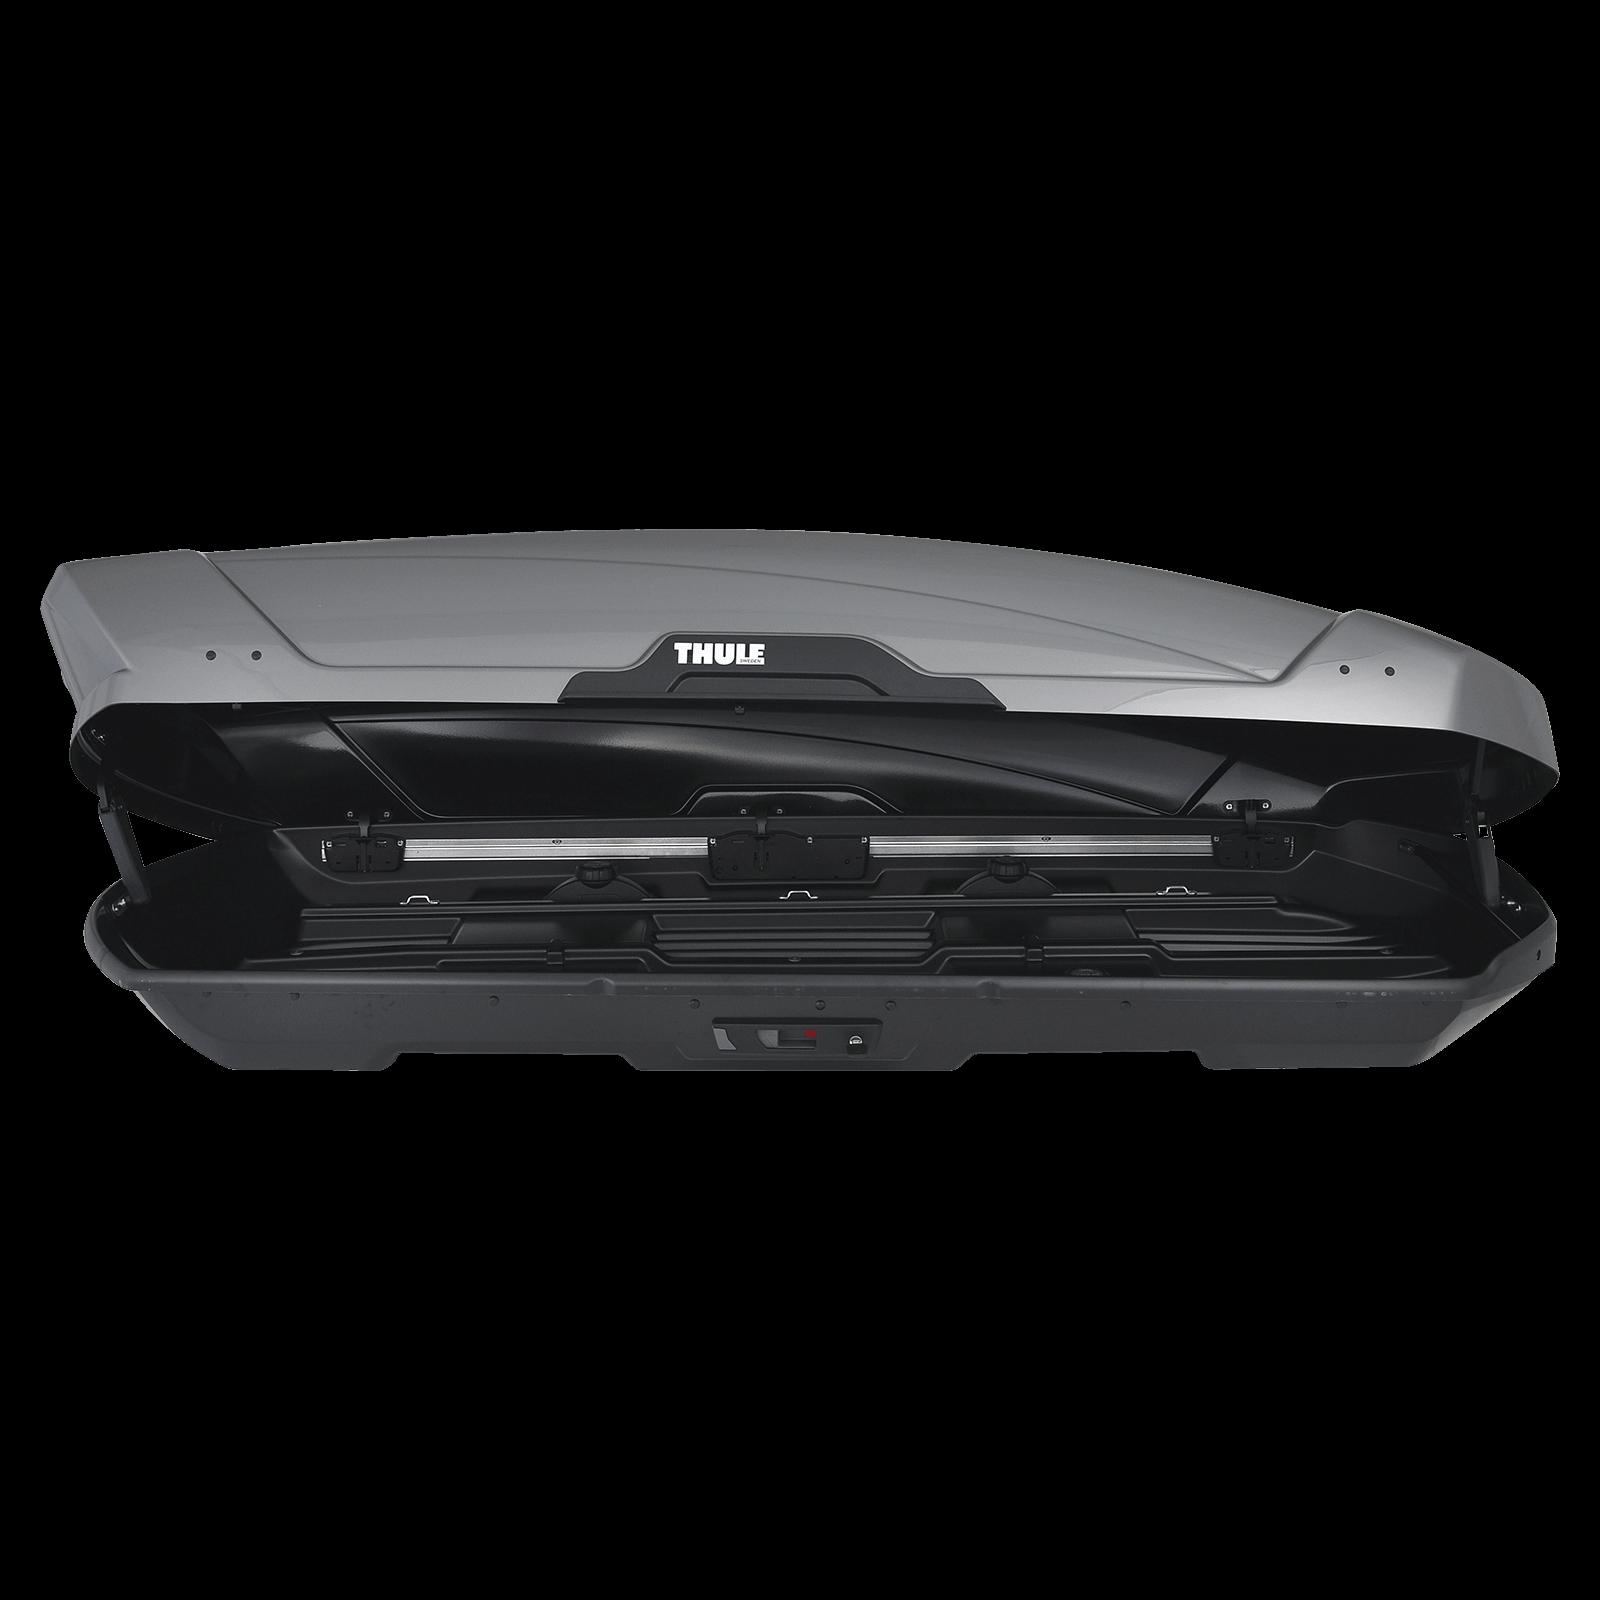 Dachbox Thule Motion XT XL Titan Glossy - Bild 2